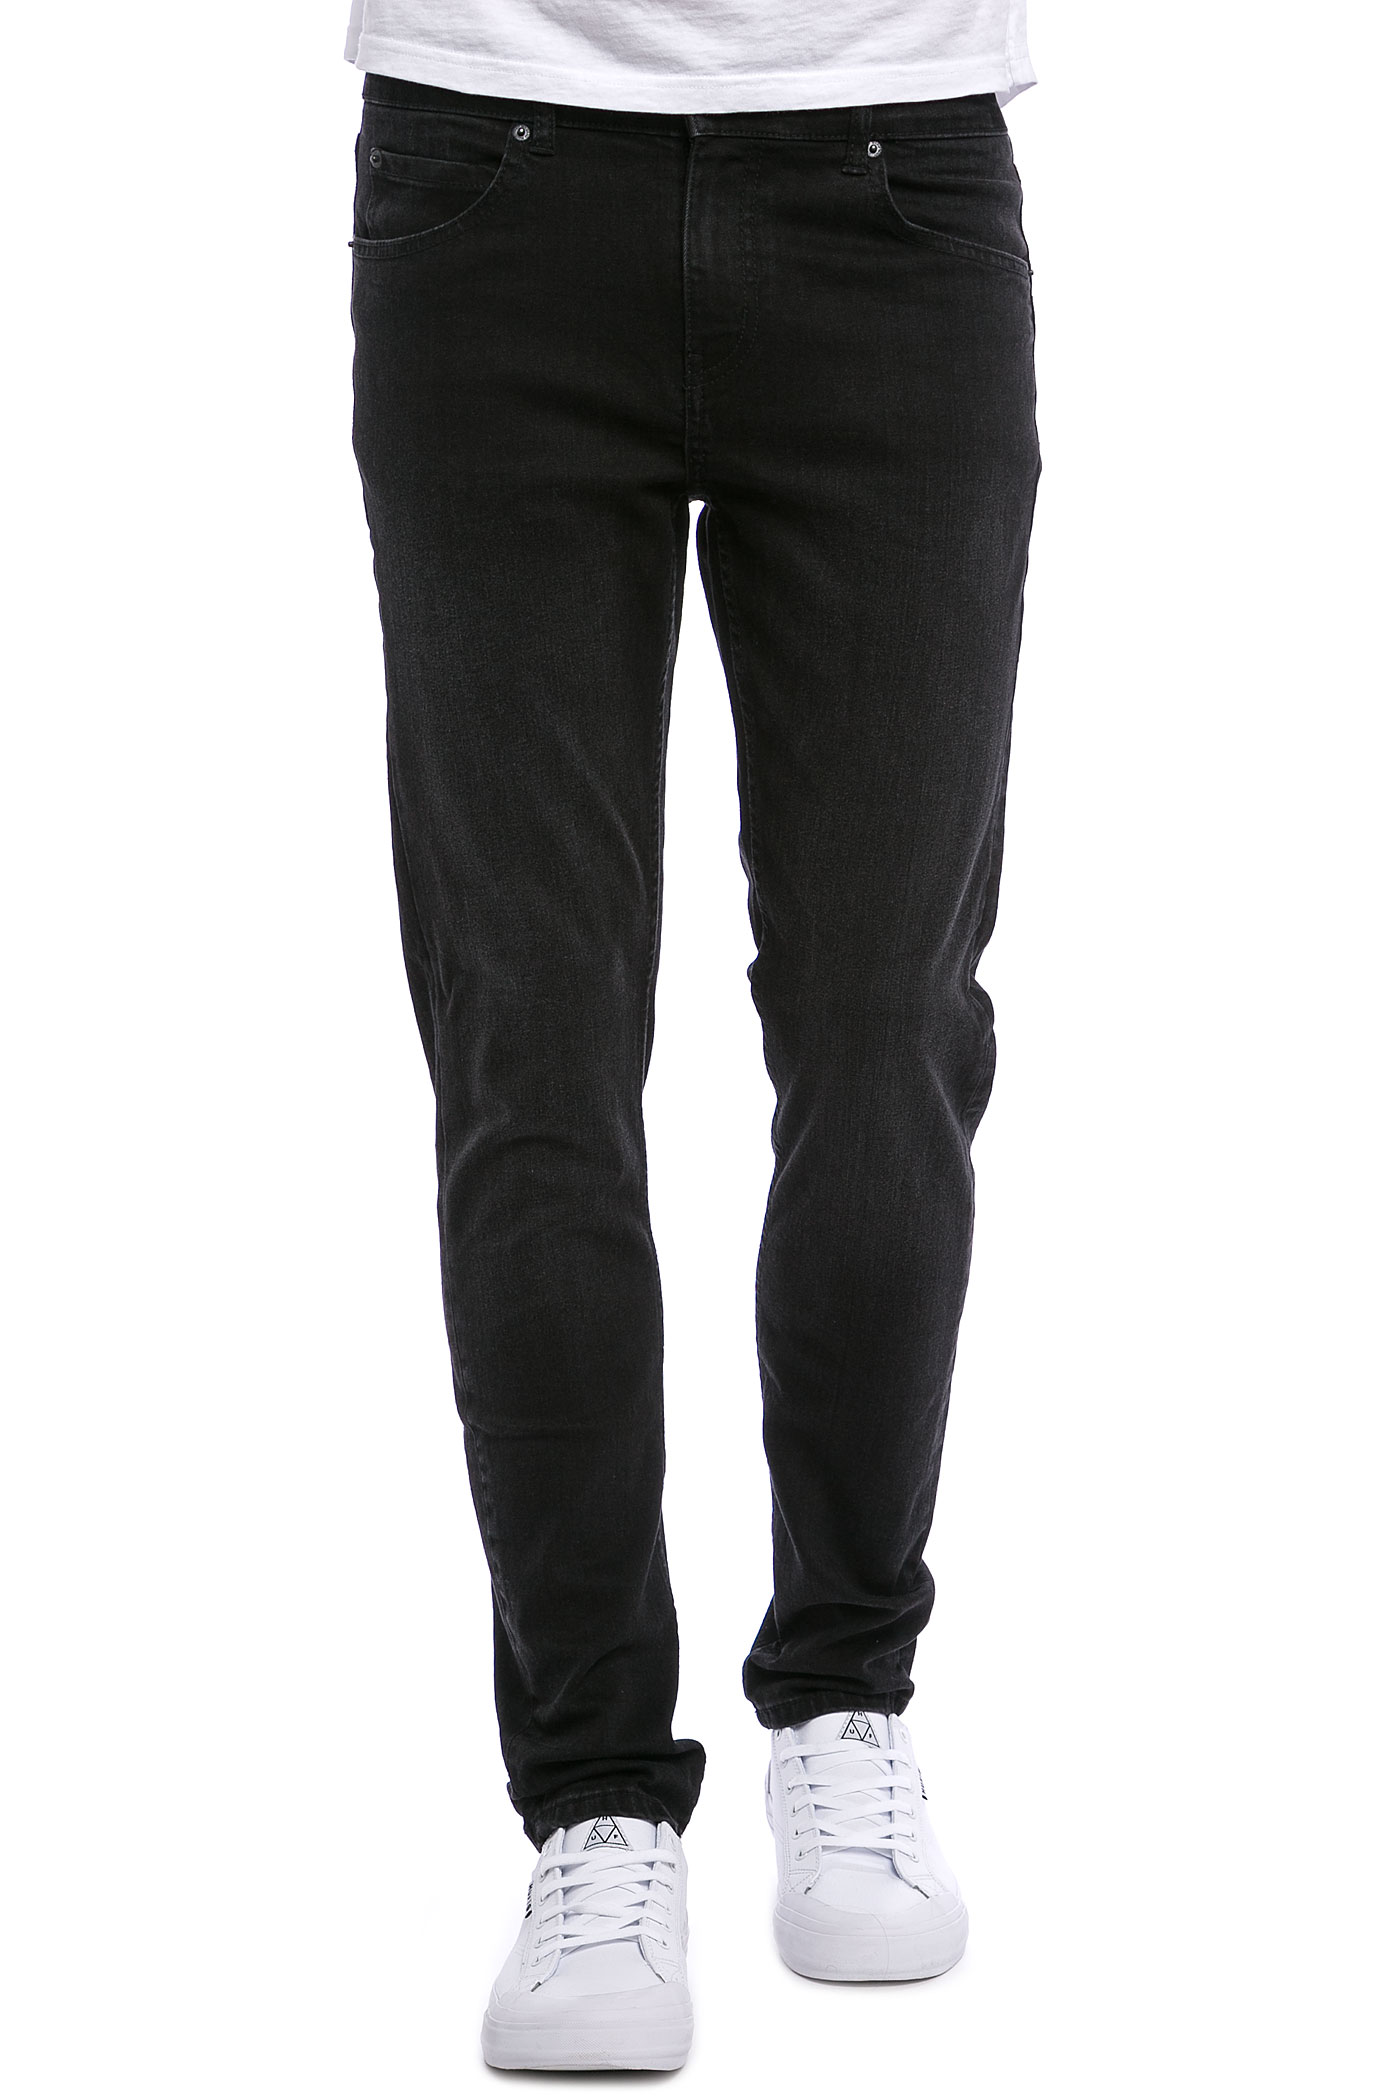 Cheap Monday Tight Jeans (black haze) buy at skatedeluxe